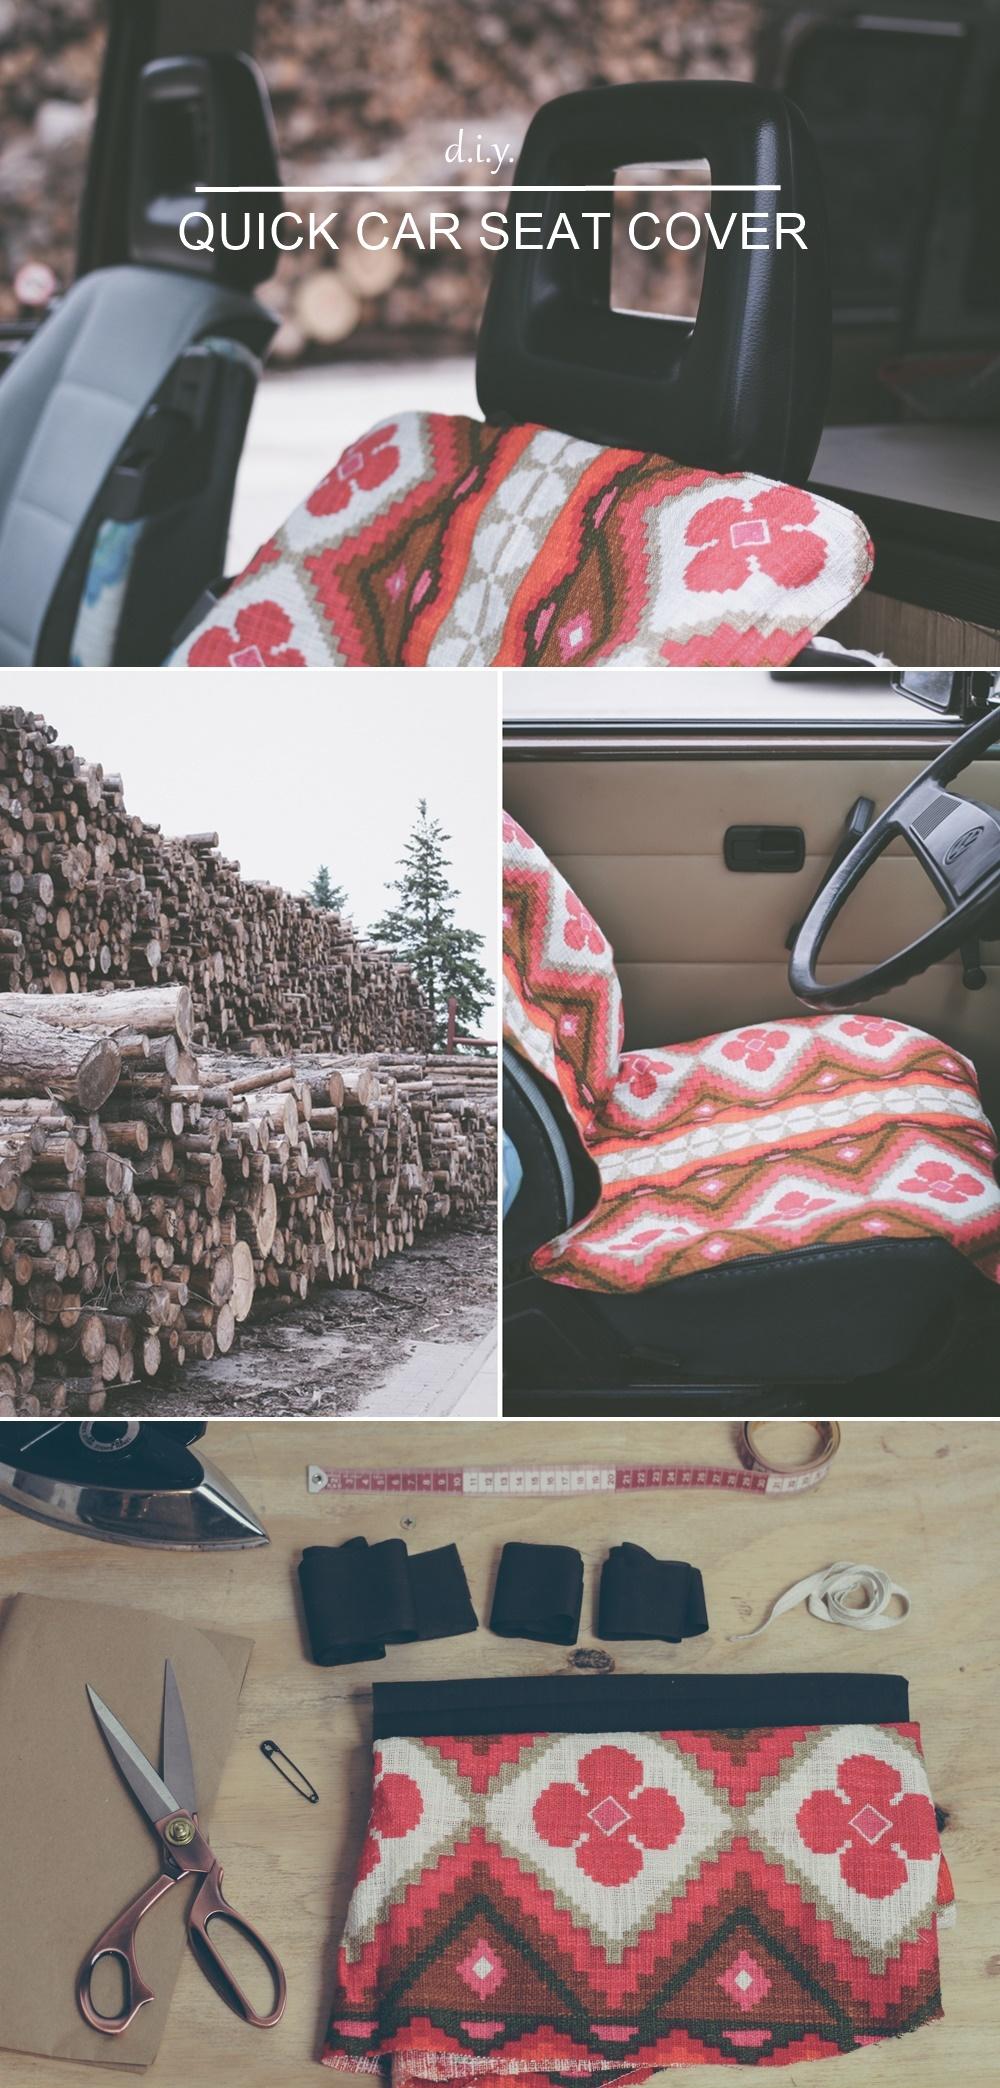 diy quick car seat cover schneller autositzschoner aus baumwolle n hmarie. Black Bedroom Furniture Sets. Home Design Ideas